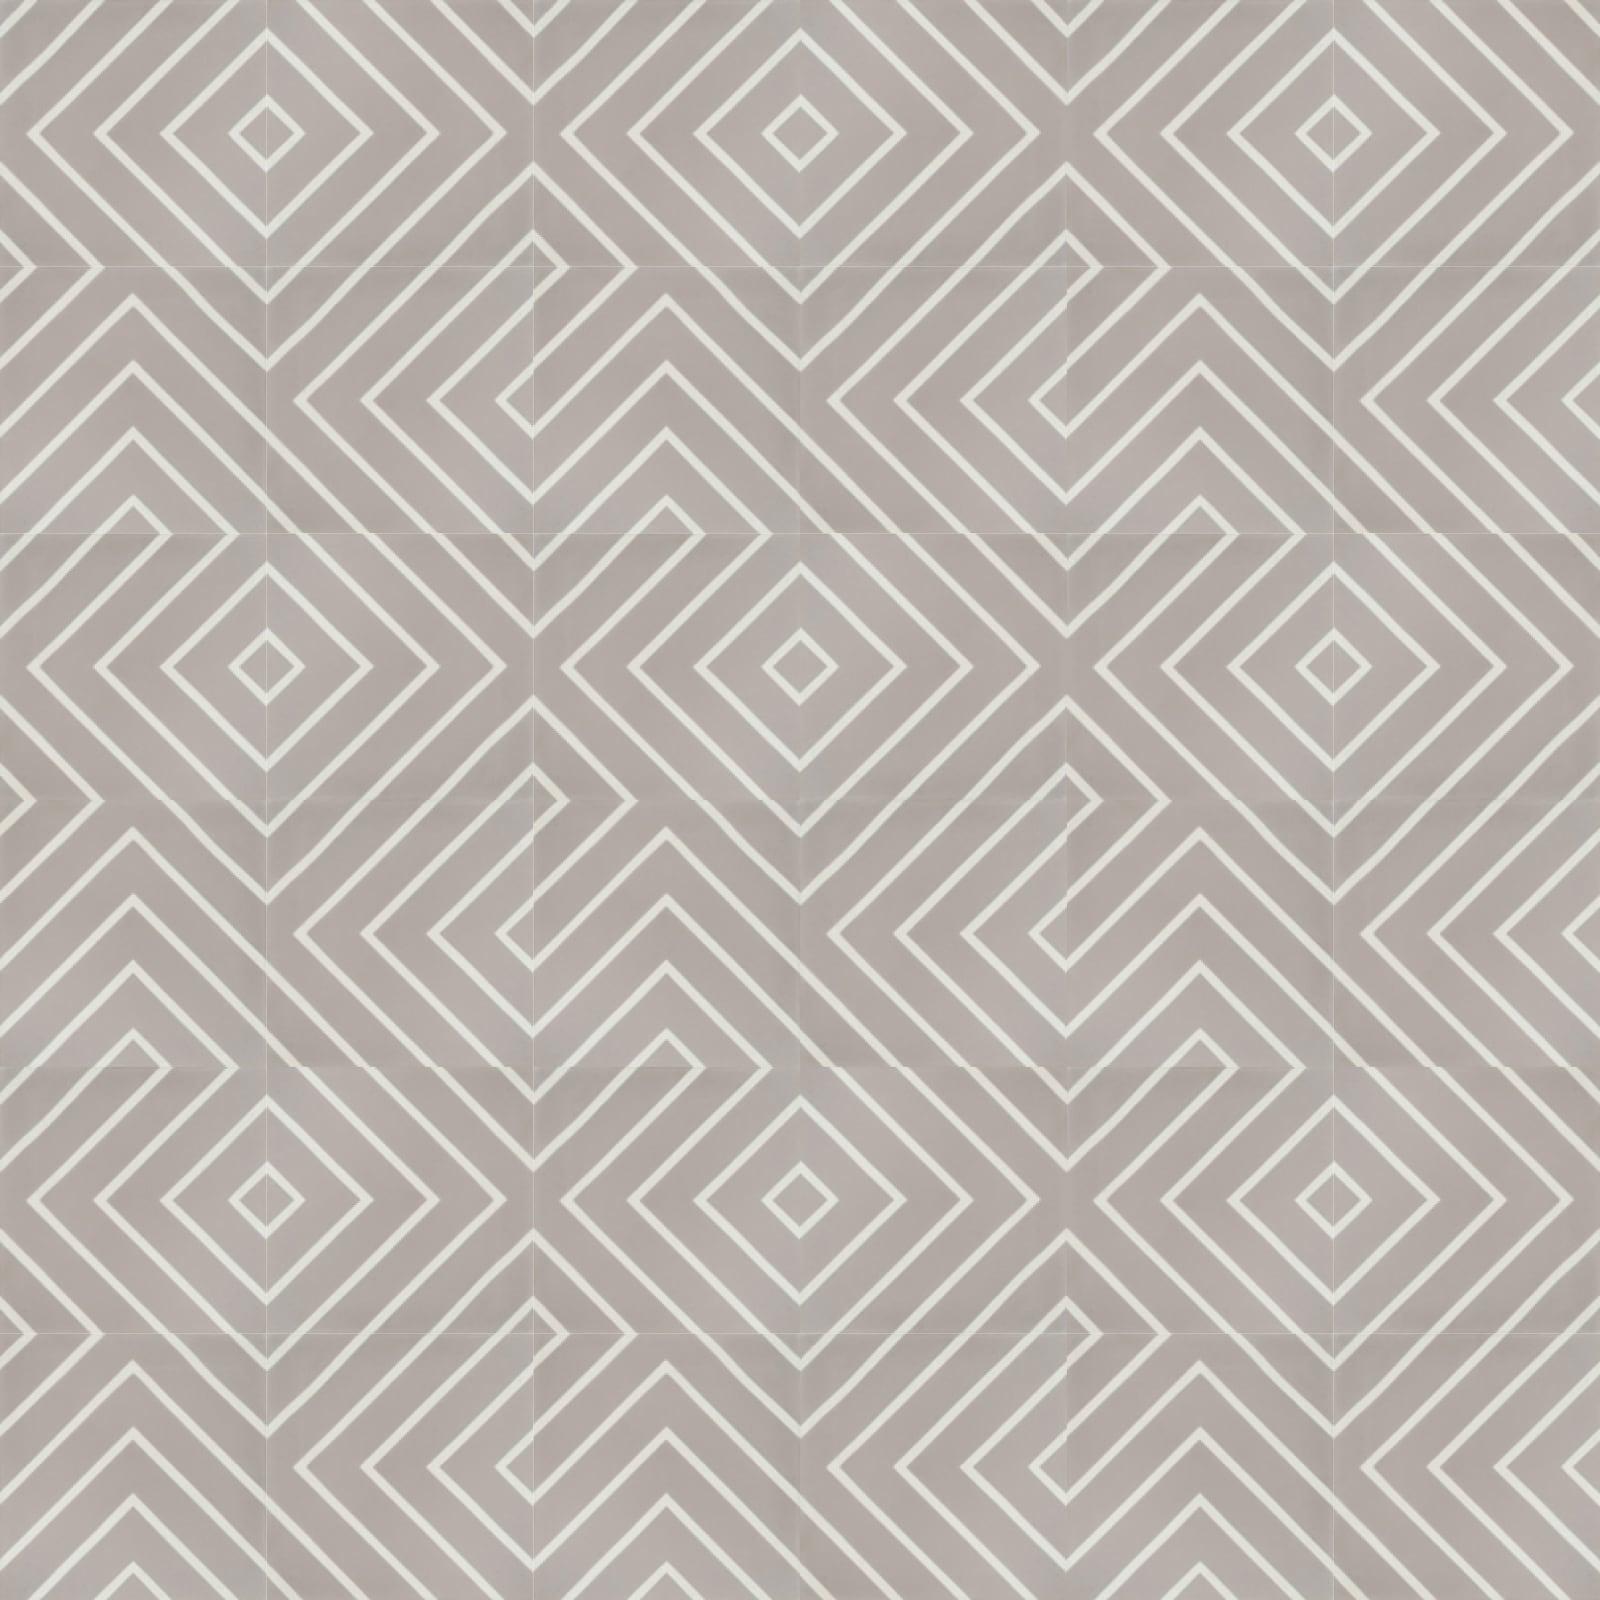 zementmosaikplatten-51174-Verlegemuster_A-via-gmbh | N° 51174